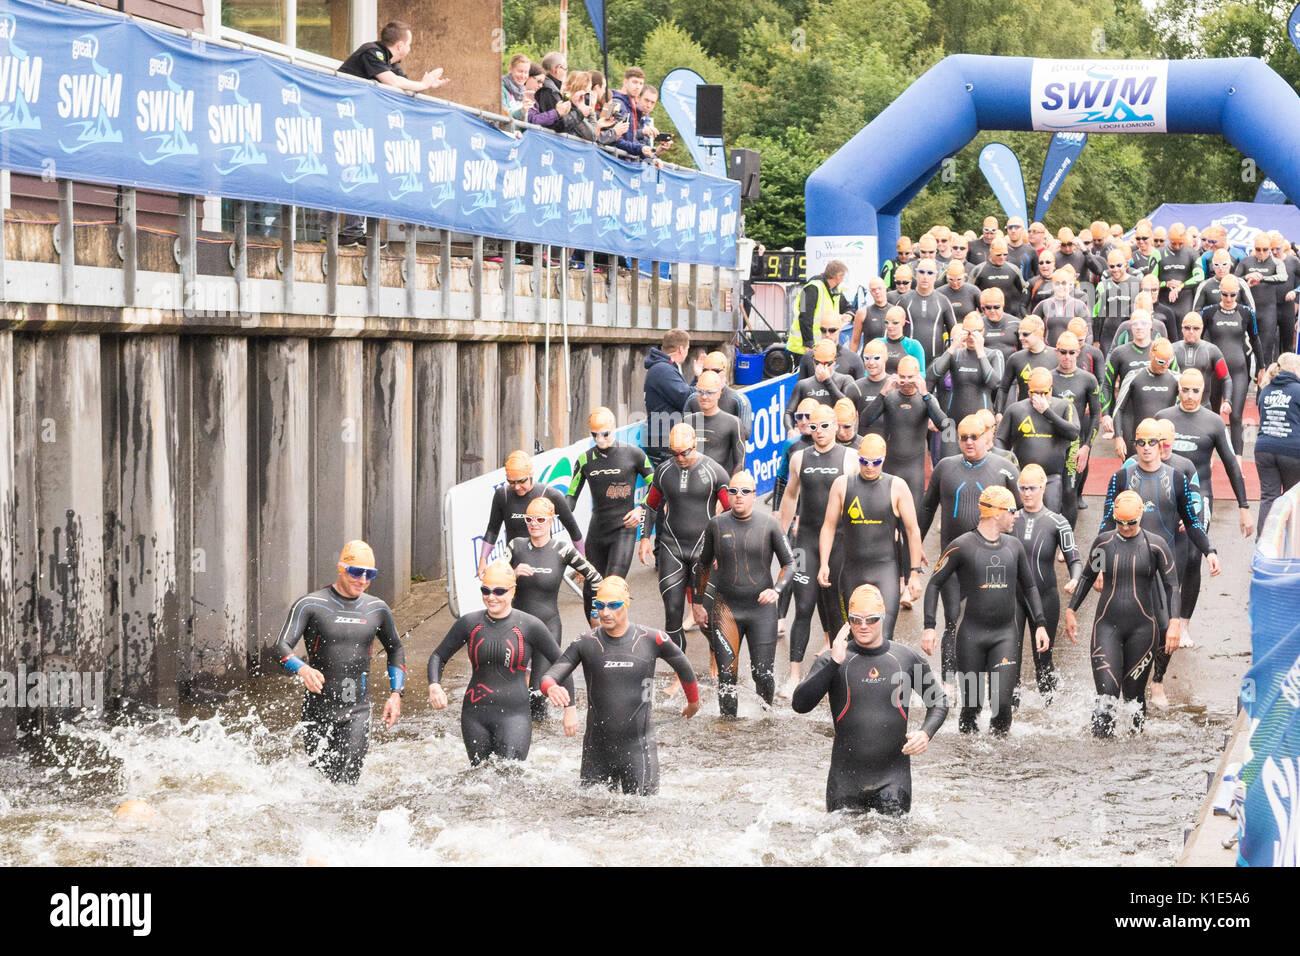 The Great Scottish Swim 2017, Loch Lomond, Scotland, UK - Stock Image